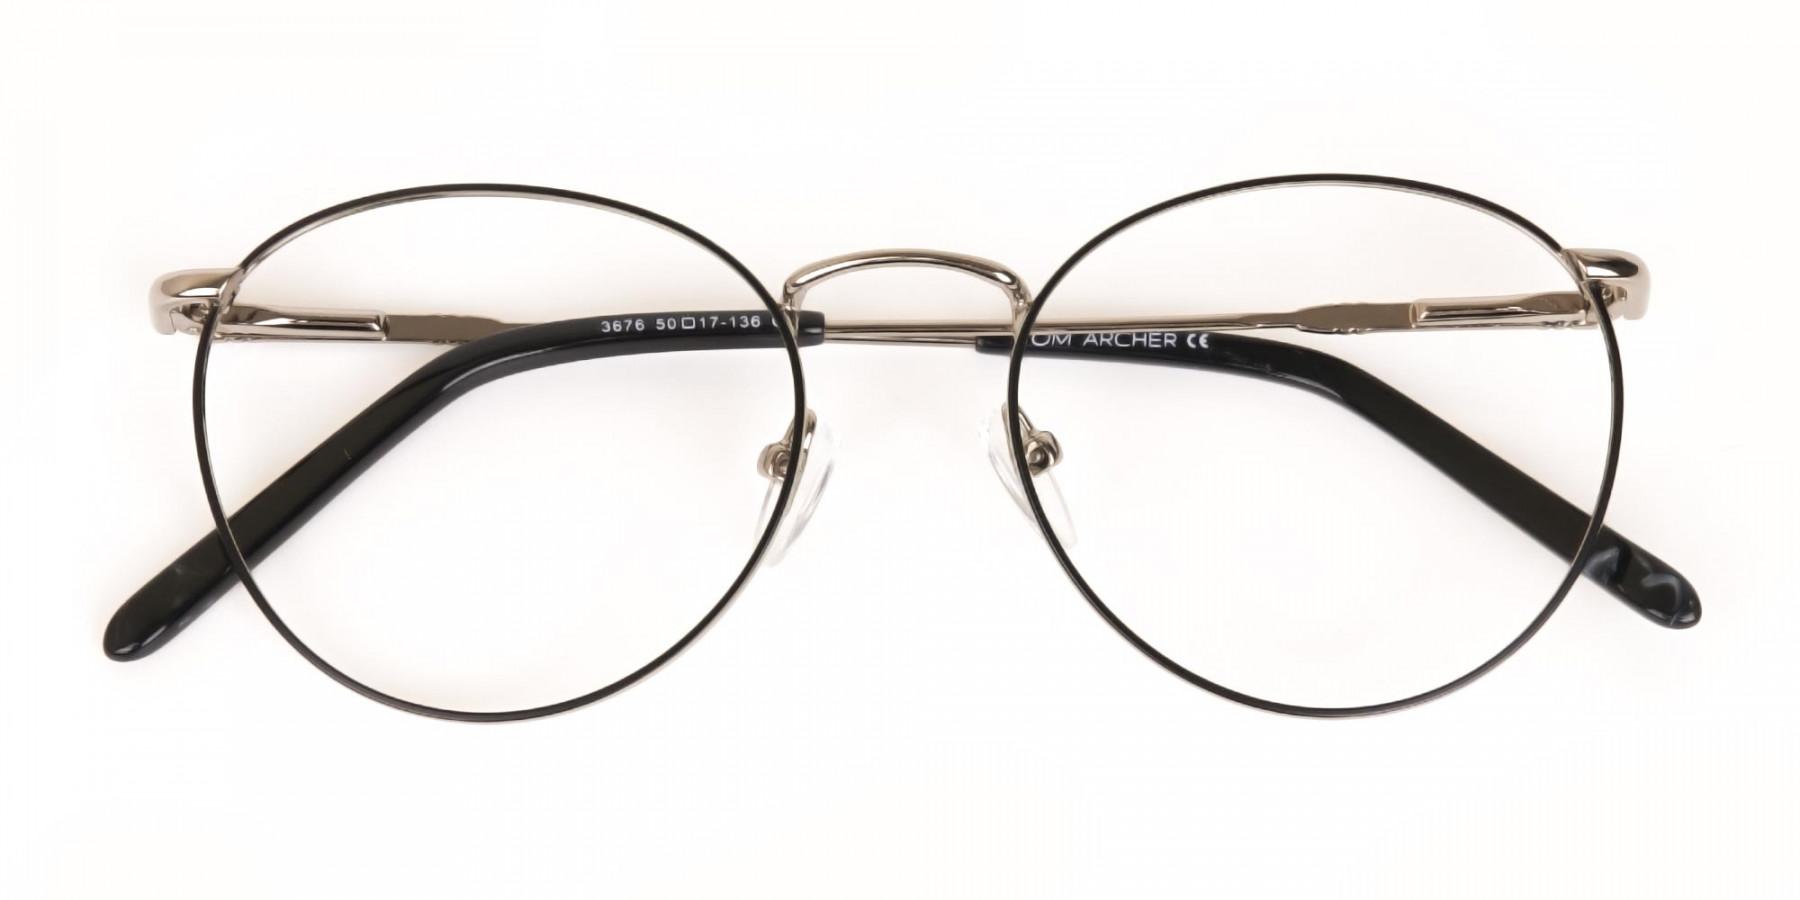 Black & Silver Round Metal Glasses Unisex-1